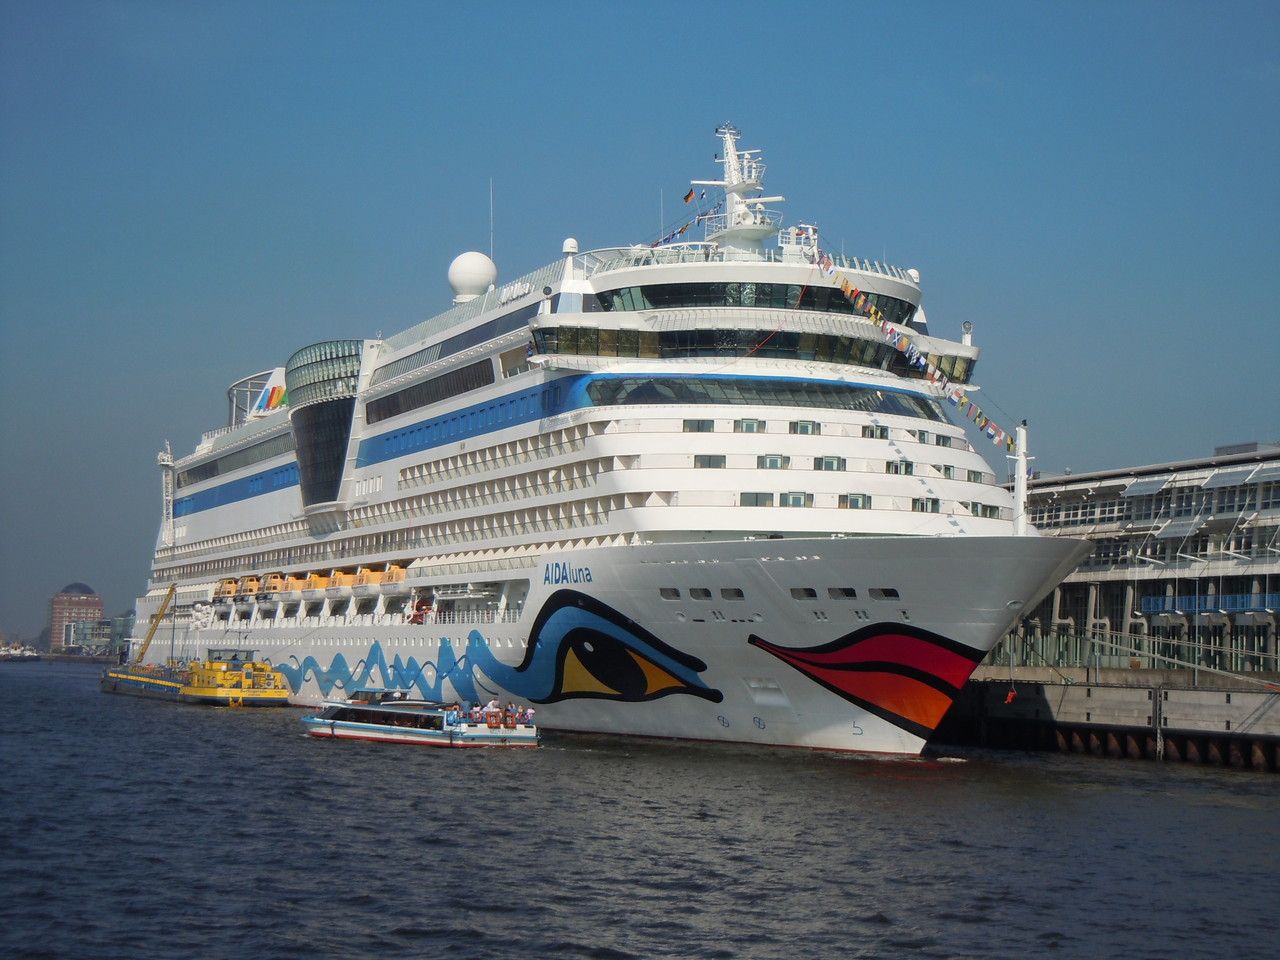 Die AidaLuna in Hamburg